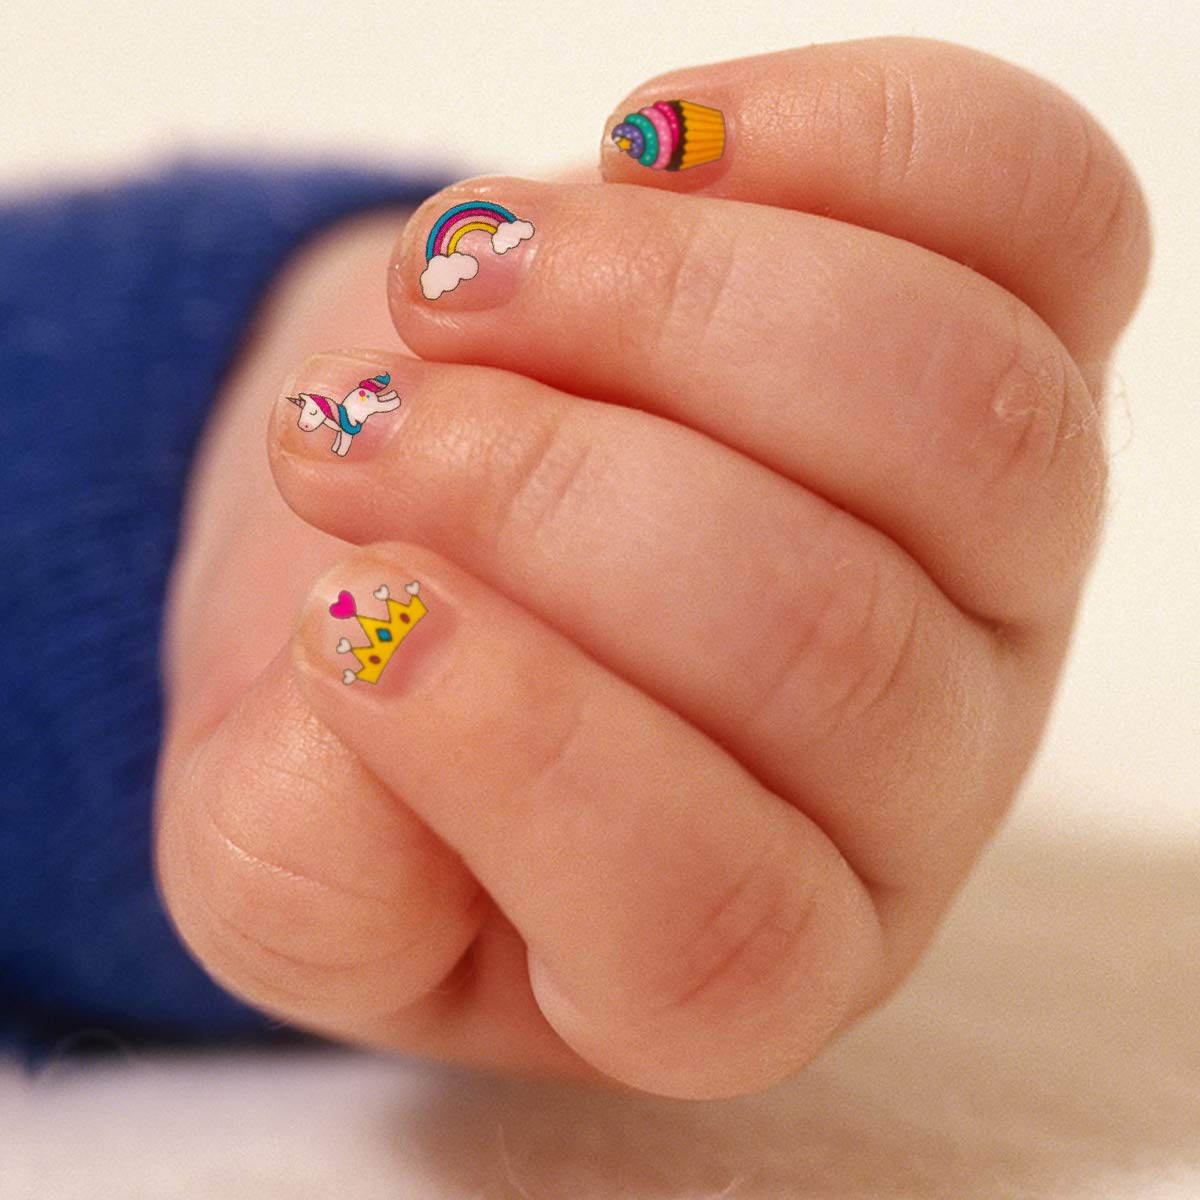 Unicorn Tipped Nail Art: Madholly 10 Sheets Self Adhesive Unicorn Nail Art Stickers